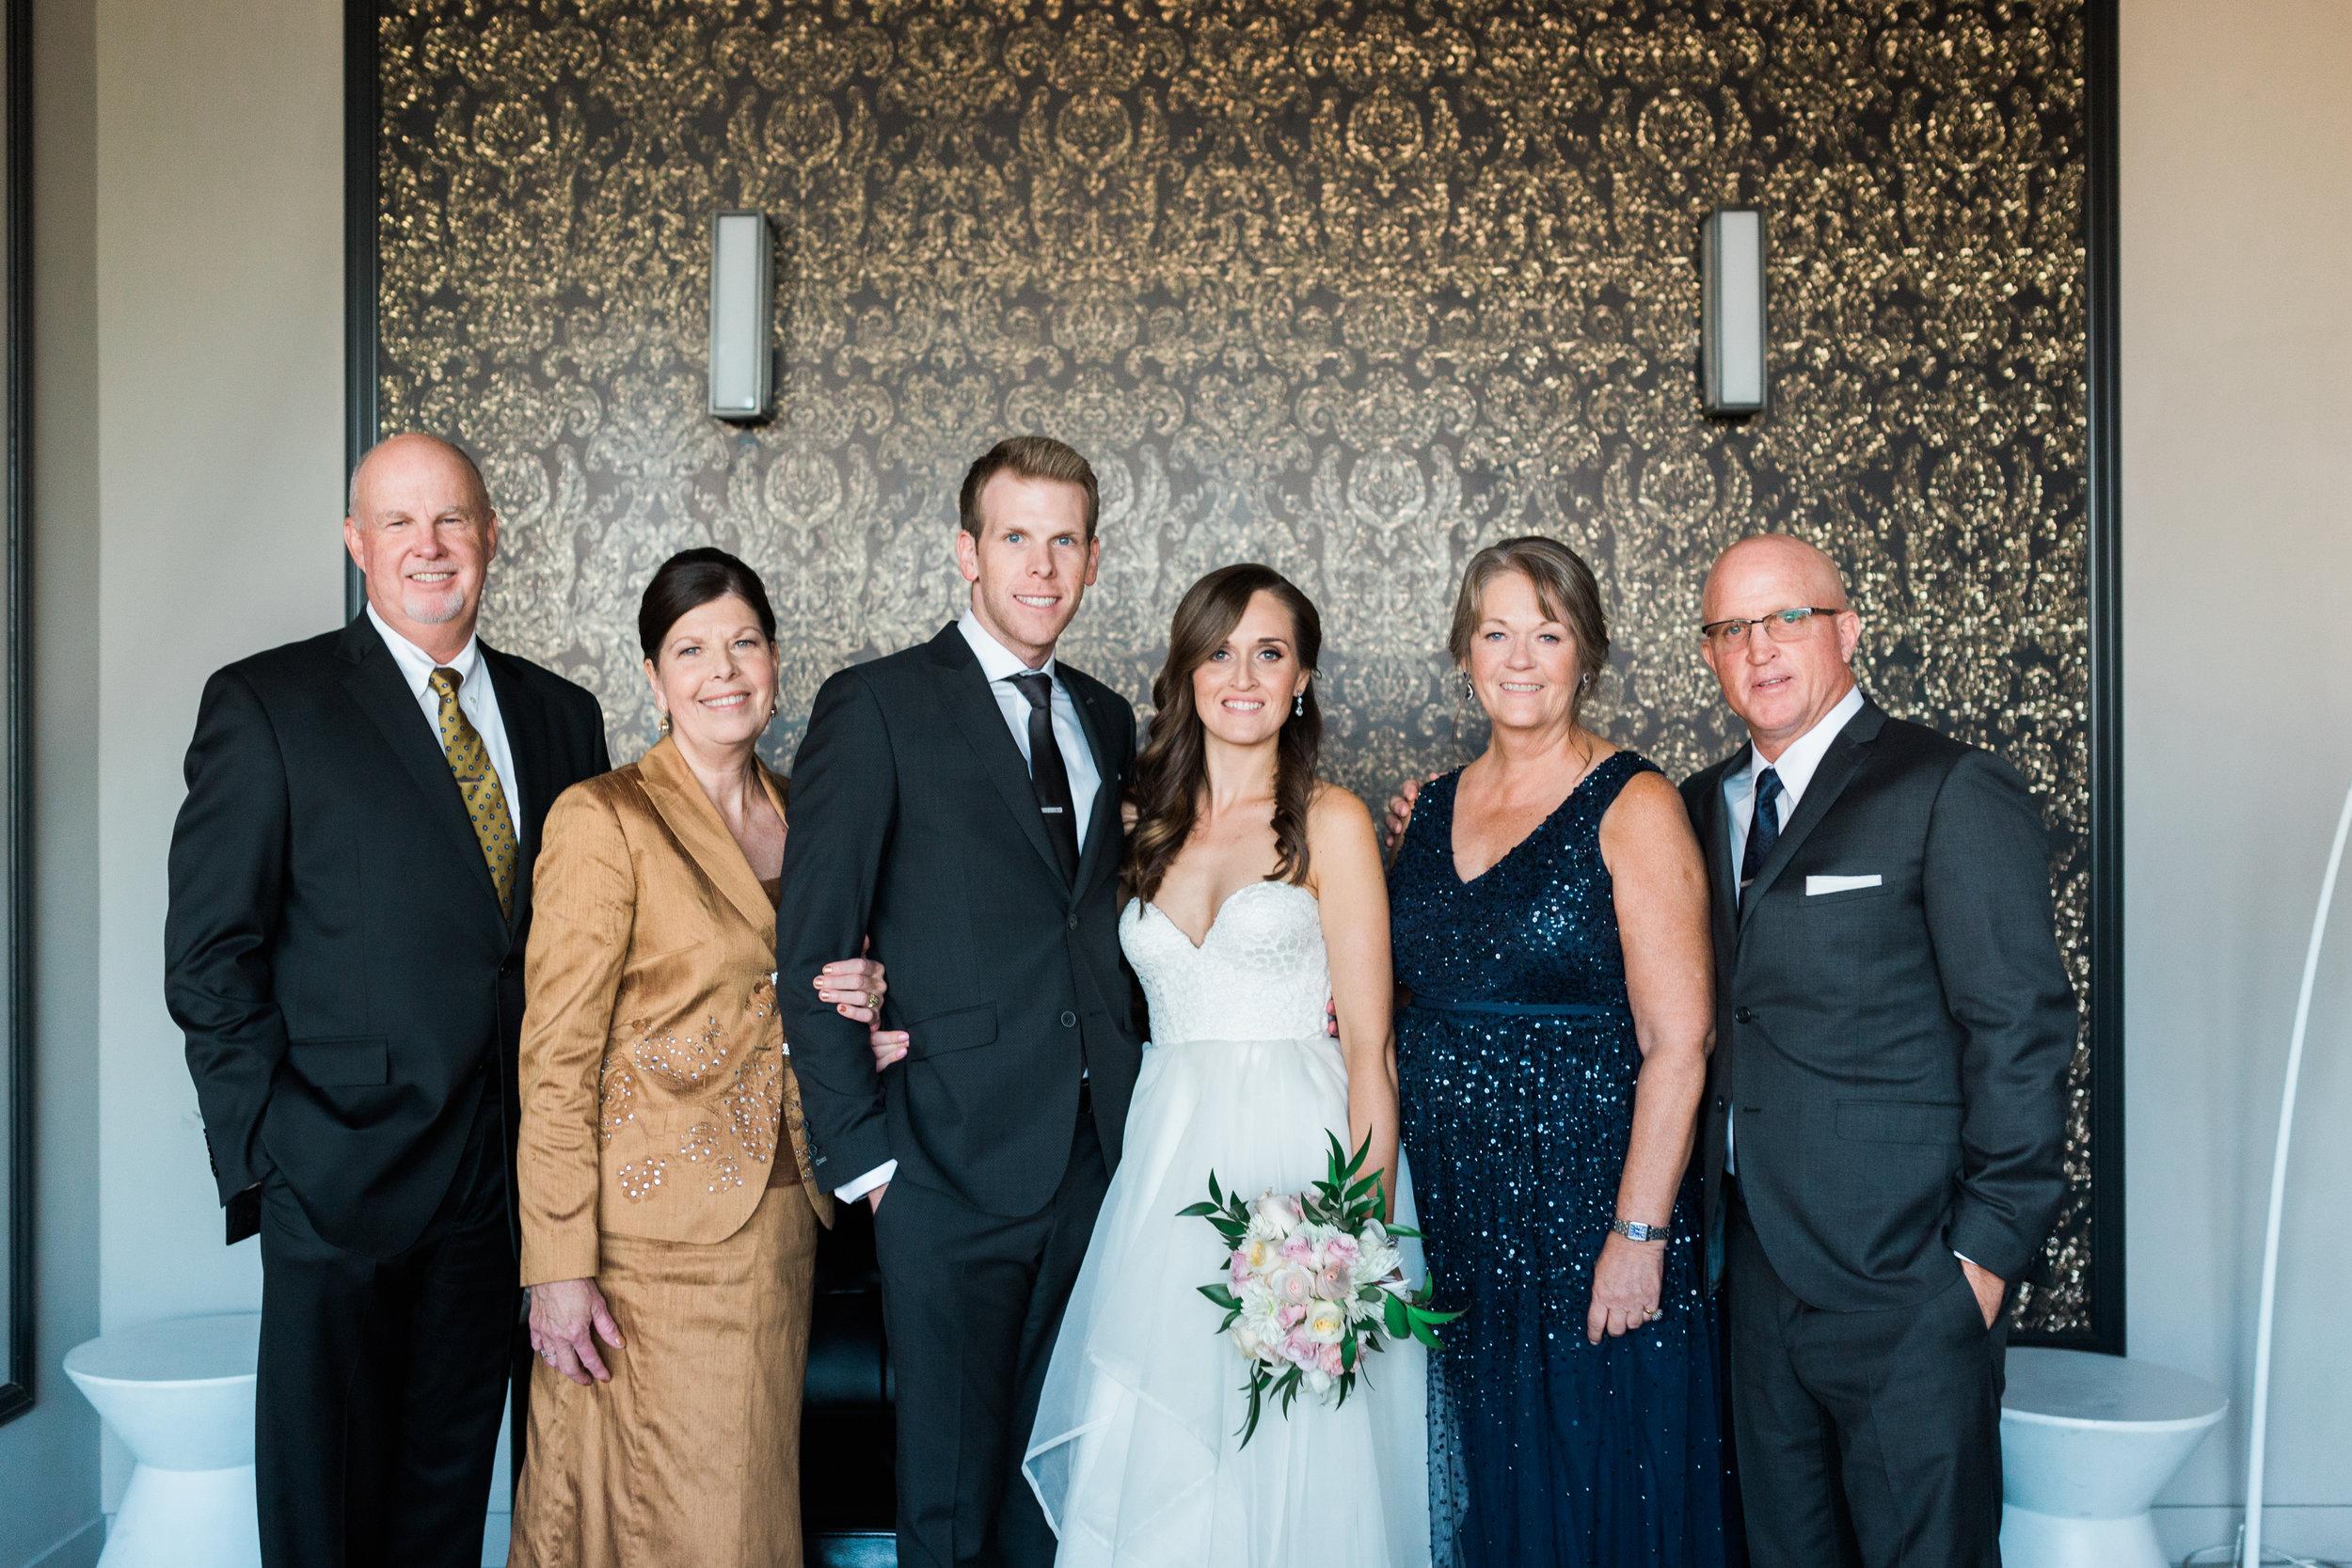 Toronto Fine Art Photographer - 180 Restaurant Wedding - Family Portraits-12.jpg